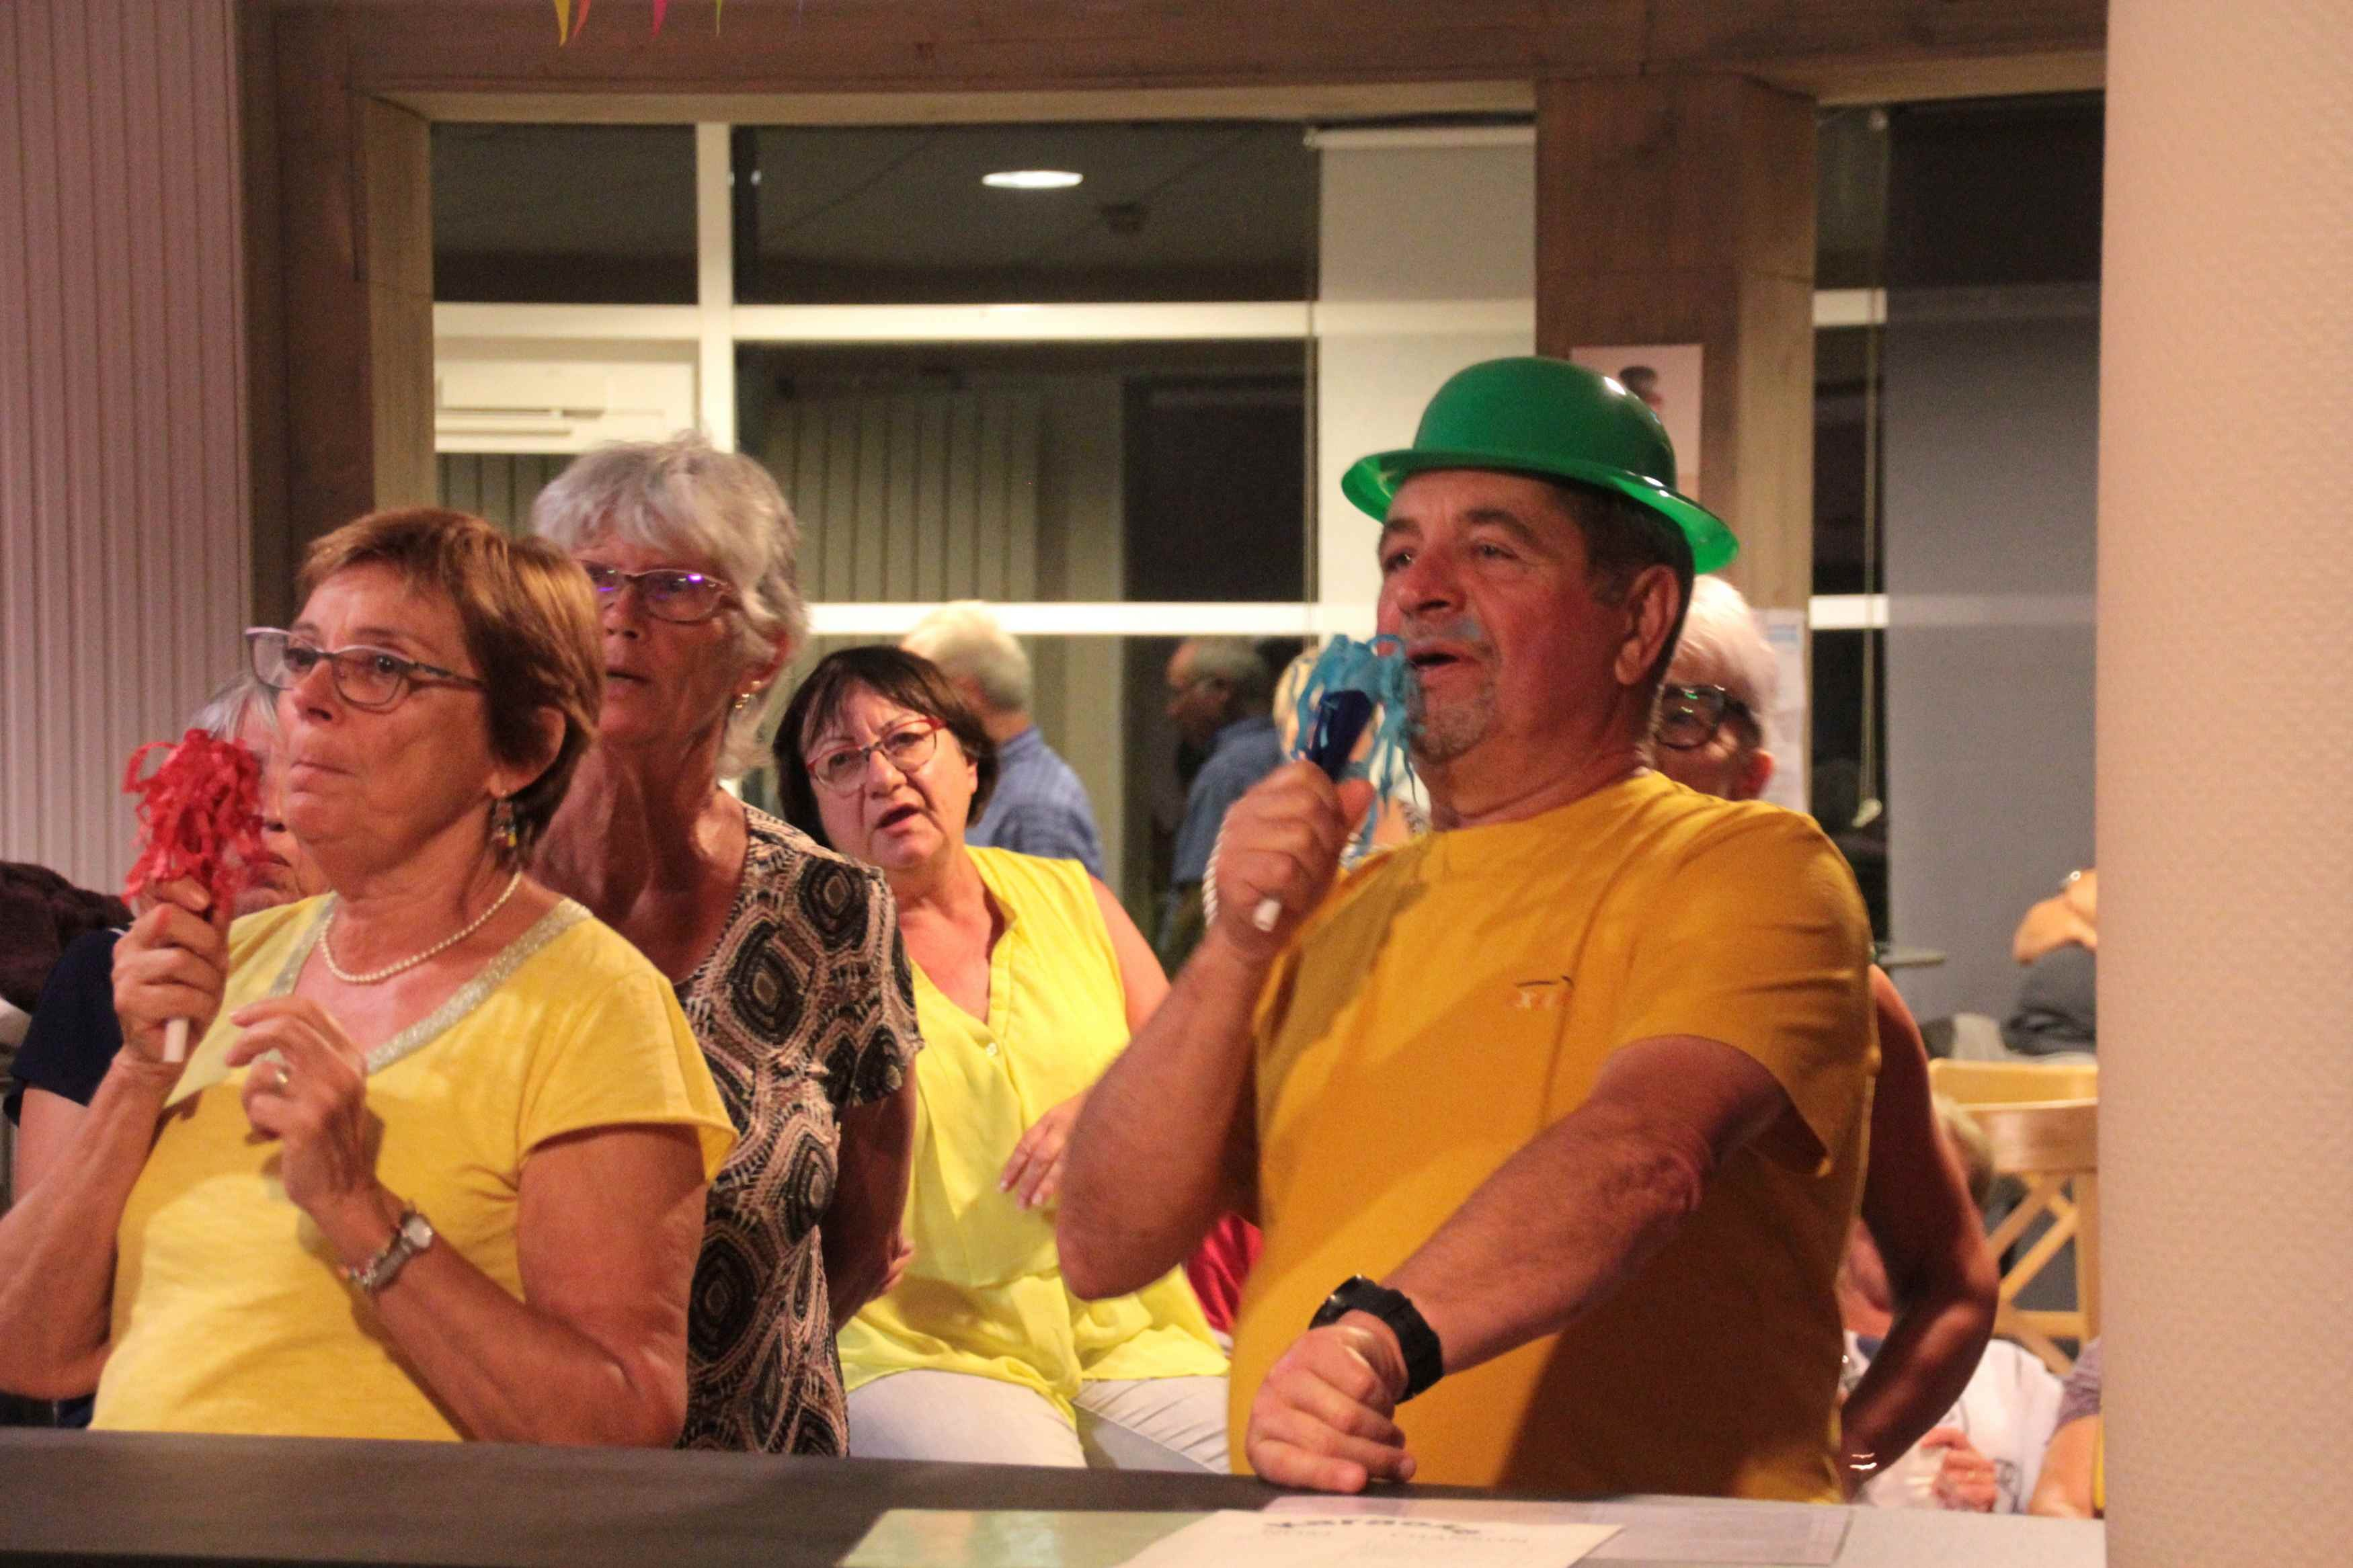 2020 09 13 0632 m soiree karaoke les tourelles normandie